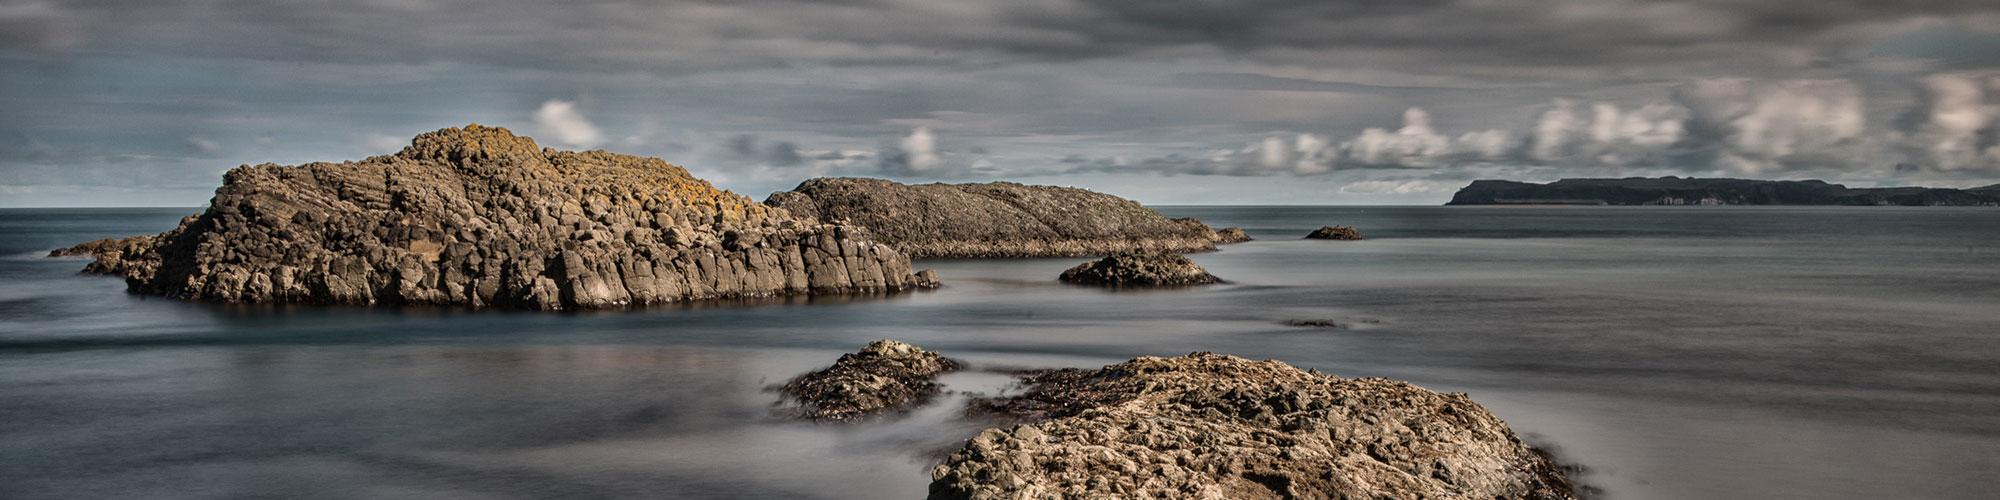 ©Charles Borsboom - Noord-Ierland